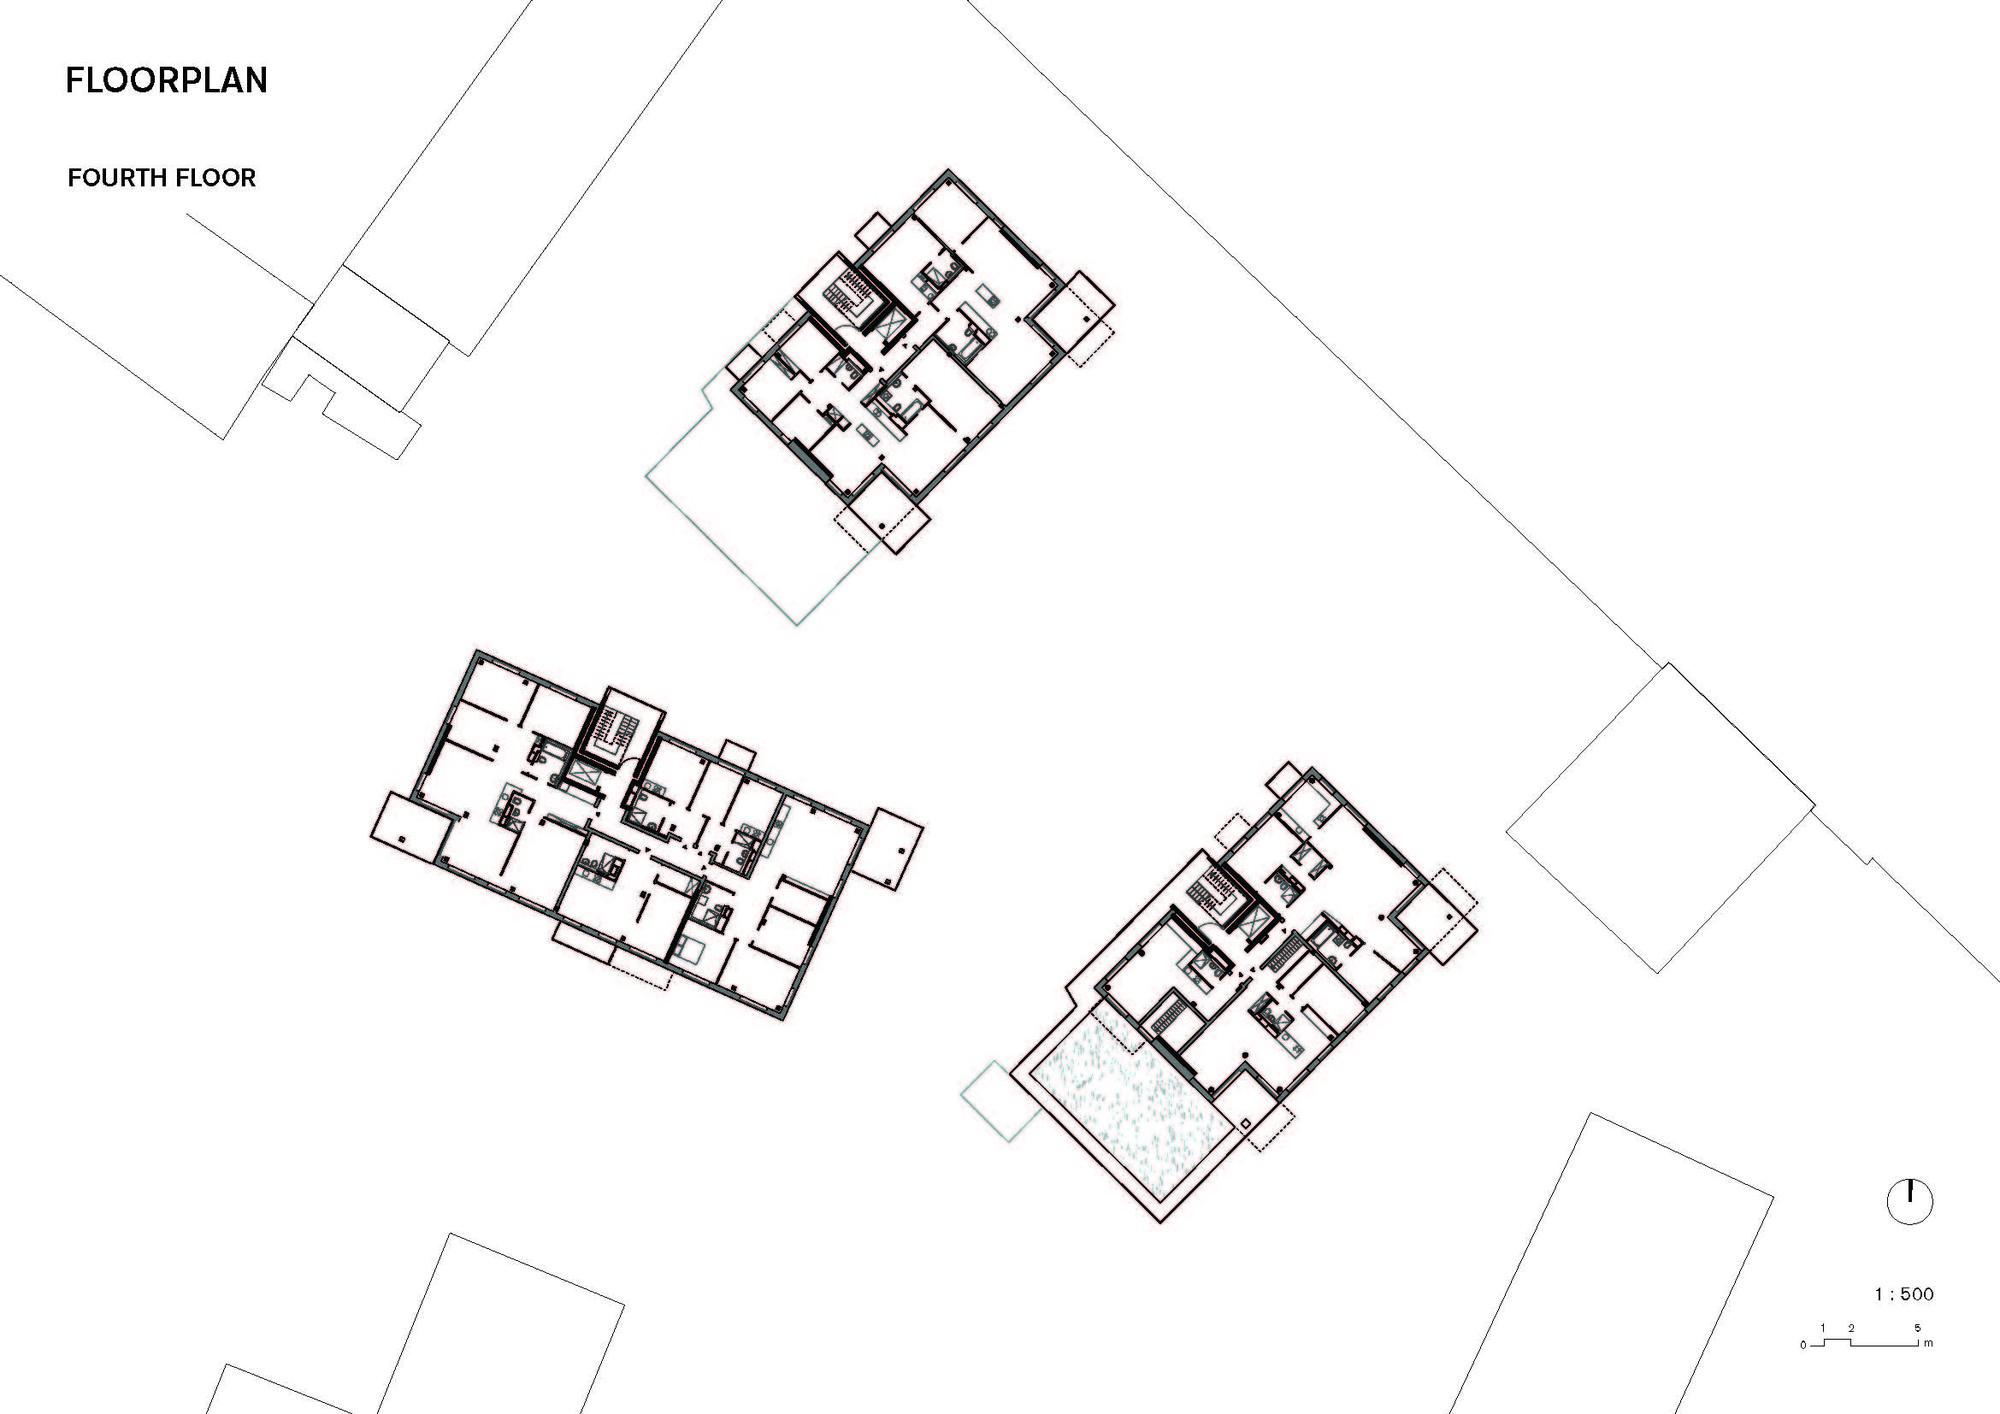 galer a de viviendas coop en el r o spreefeld carpaneto architekten fatkoehl architekten. Black Bedroom Furniture Sets. Home Design Ideas